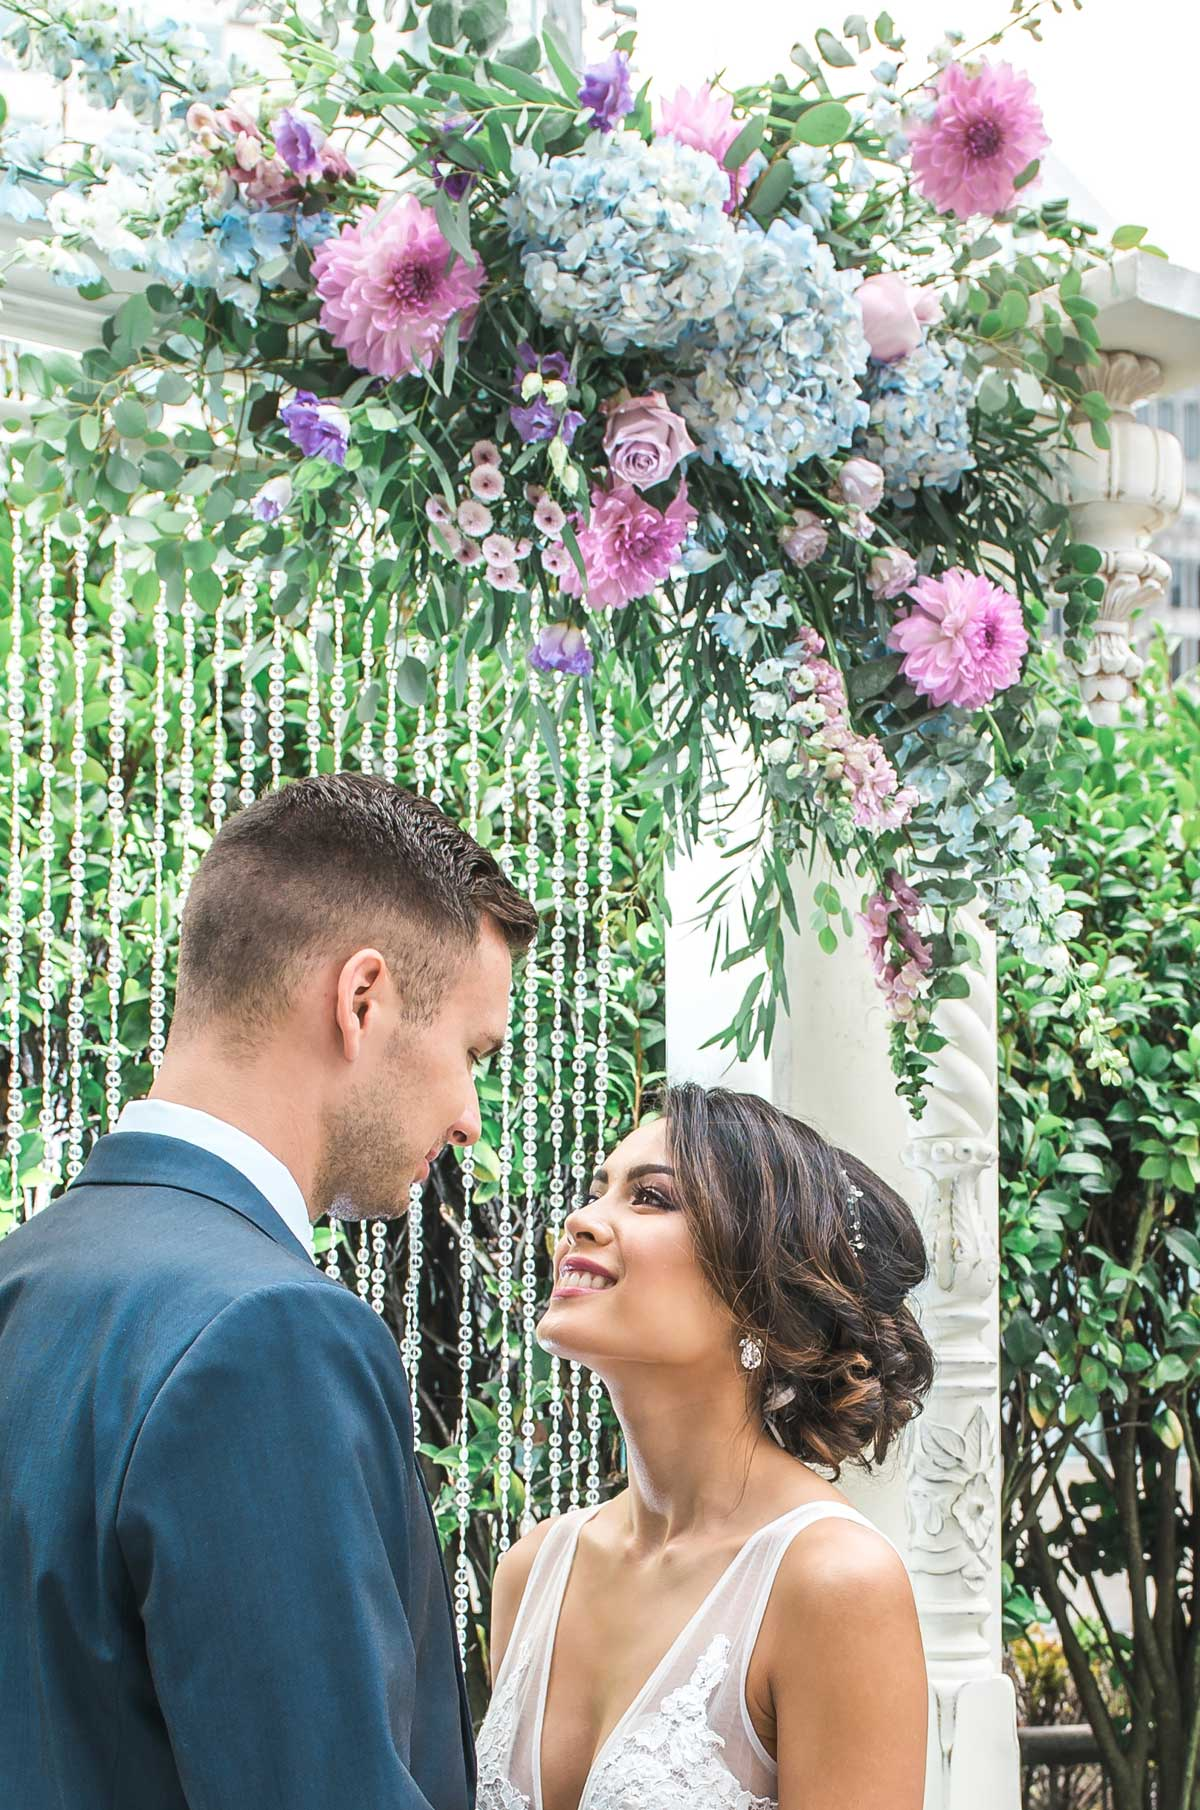 dloveaffair_wedding_bride_groom_inlove.jpg